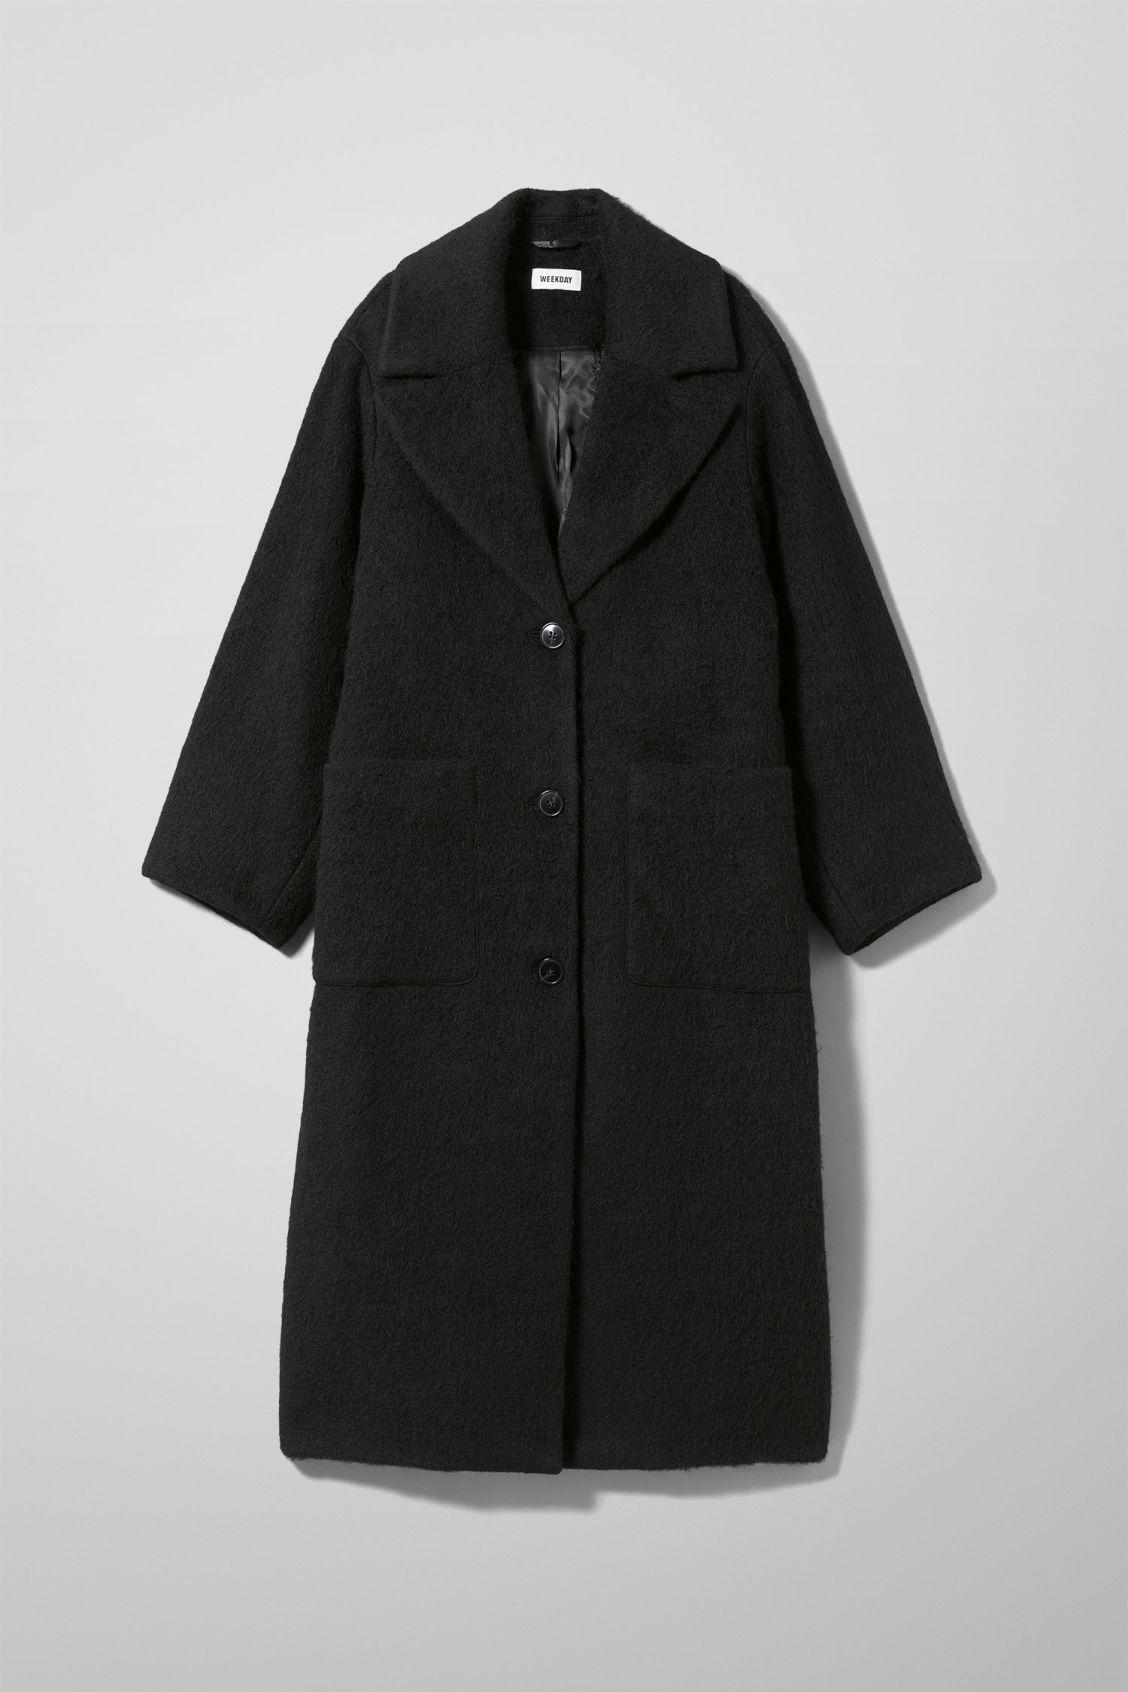 Jackets amp; Martha Black Parka Weekday Coats vqx10gH